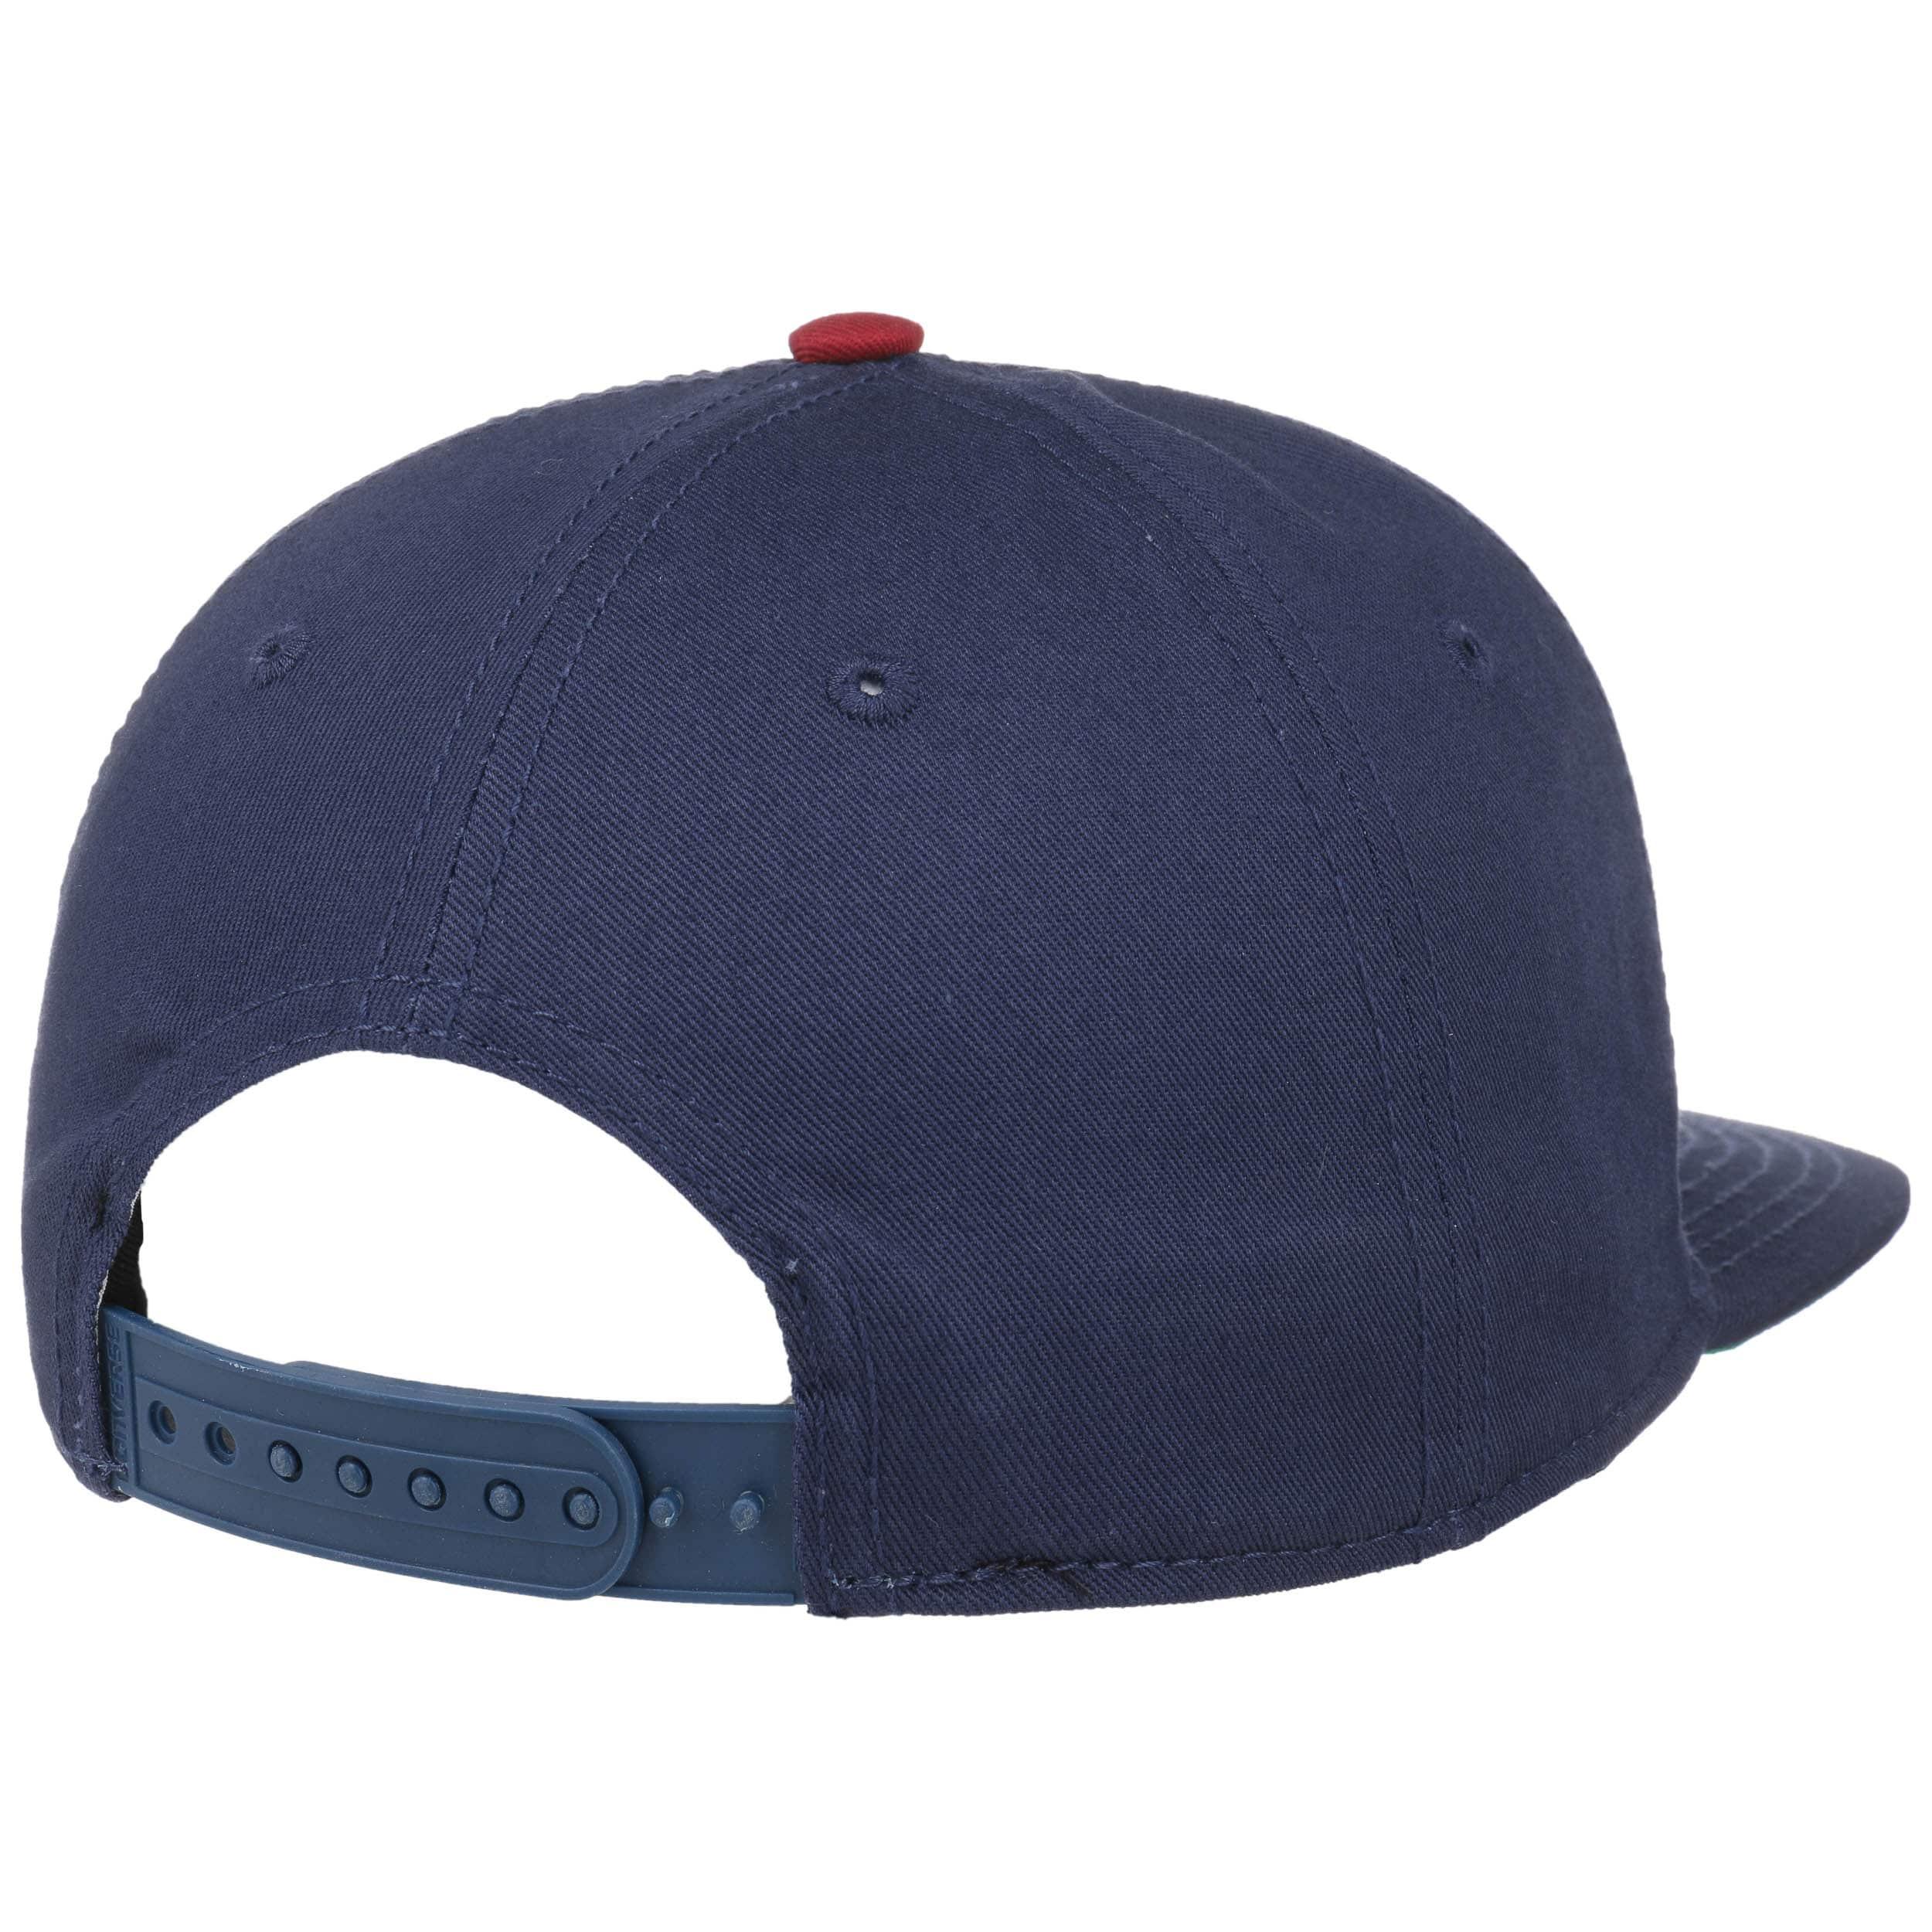 ... Chenille C Snapback Cap by Converse - navy 3 ... 0bb02bf5e3ea